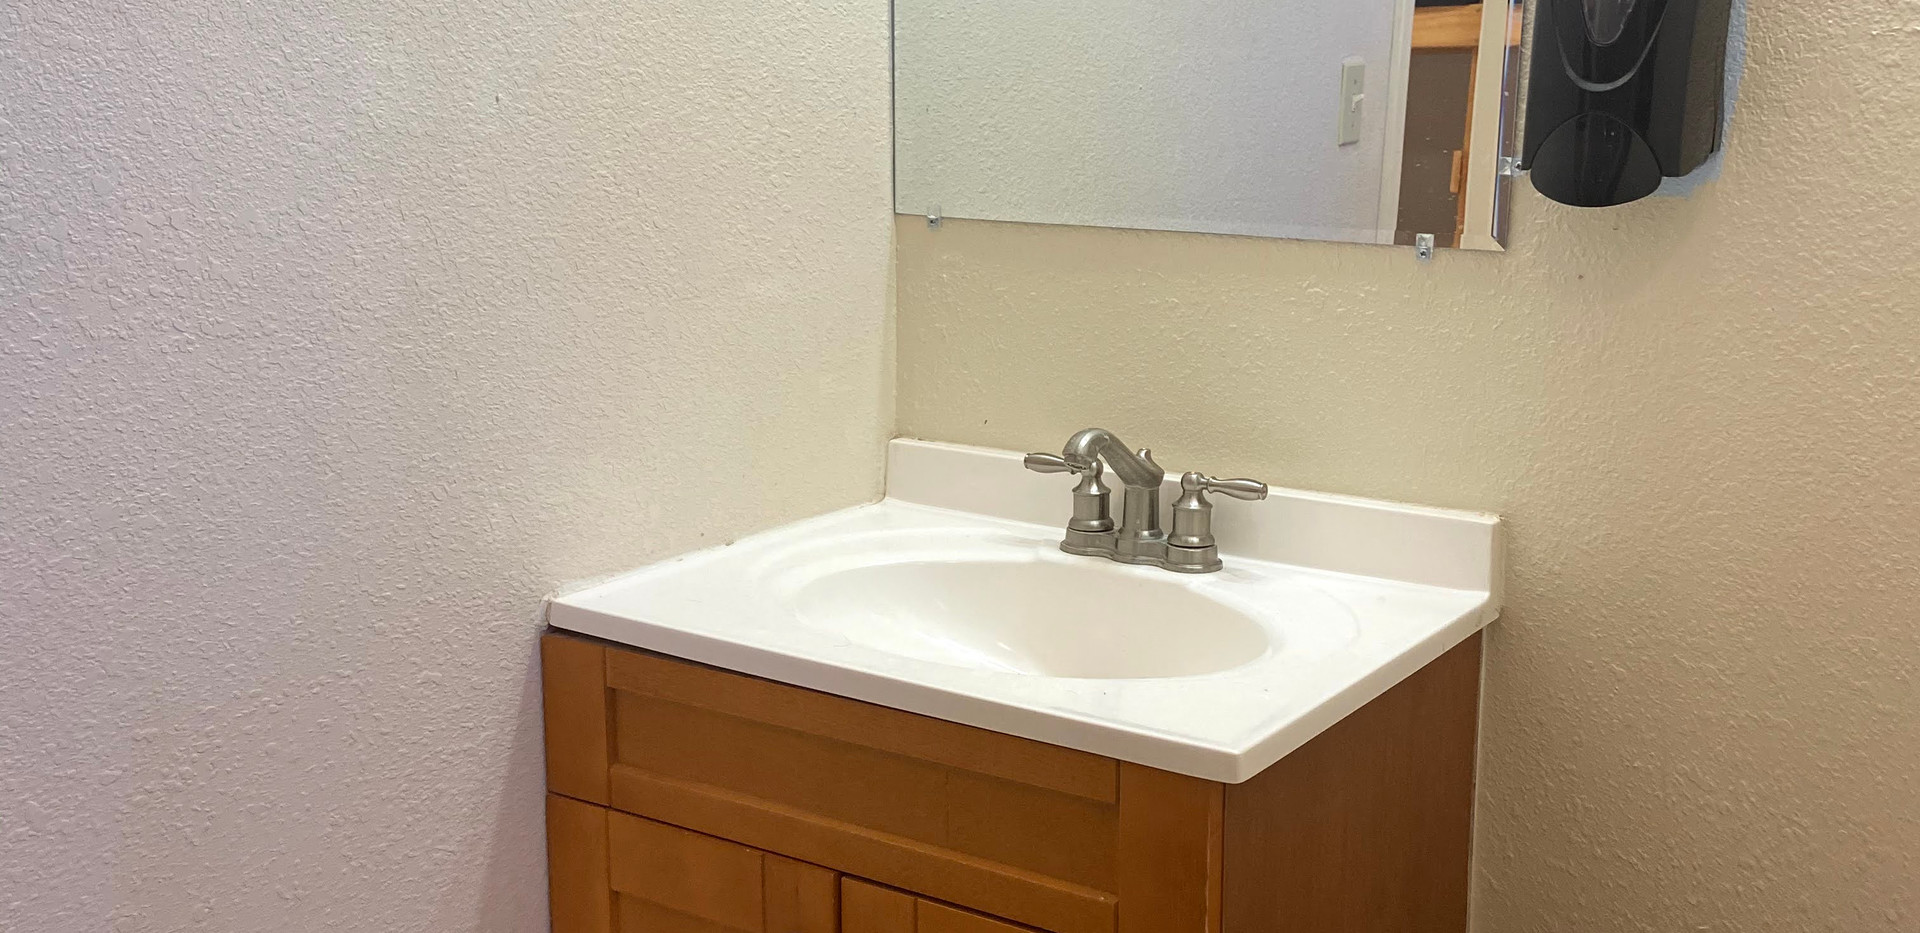 Eagle's Roost Bathroom 2